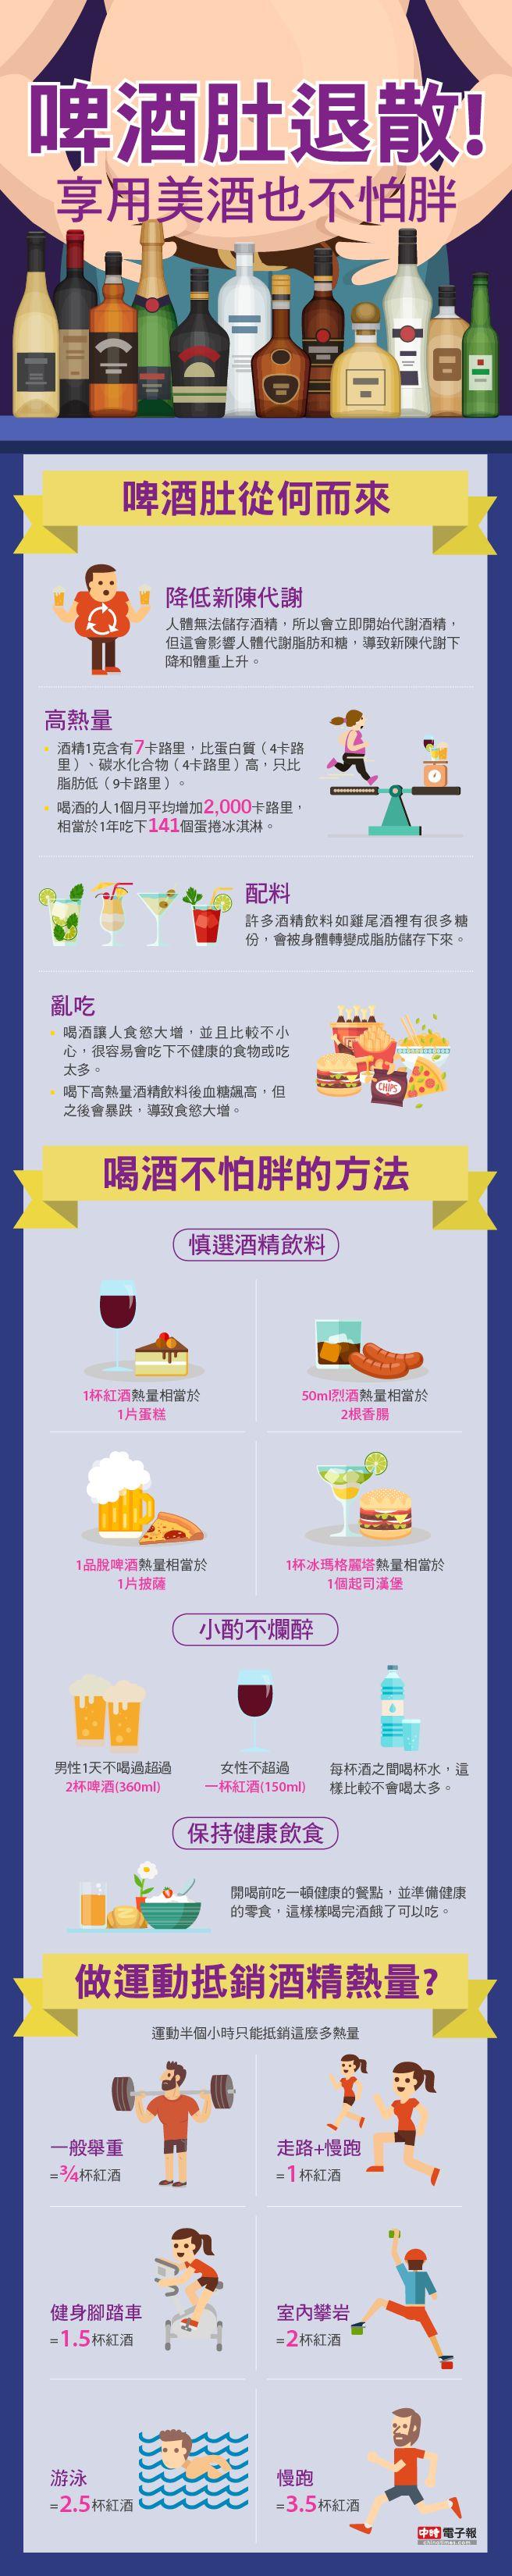 Drink without fat / 許多人都喜愛美酒,但是也會擔心喝酒容易發胖的問題。事實上喝酒會發胖的原因,除了酒精熱量高外,還有因為酒精無法被身體吸收,所以身體會優先代謝酒精,因而延緩處理脂肪和糖的時間。調酒含糖量高,也回造成血糖急遽升高和下降,因此增加食慾。喝酒也會使得人在做選擇時較輕忽,因此喝酒後比較容易亂吃或吃太多。避免喝酒發胖最好的方法,還是適量飲酒最佳,做運動能抵銷掉的酒精熱量不多,往往運動半小時後只能減去不到一杯紅…